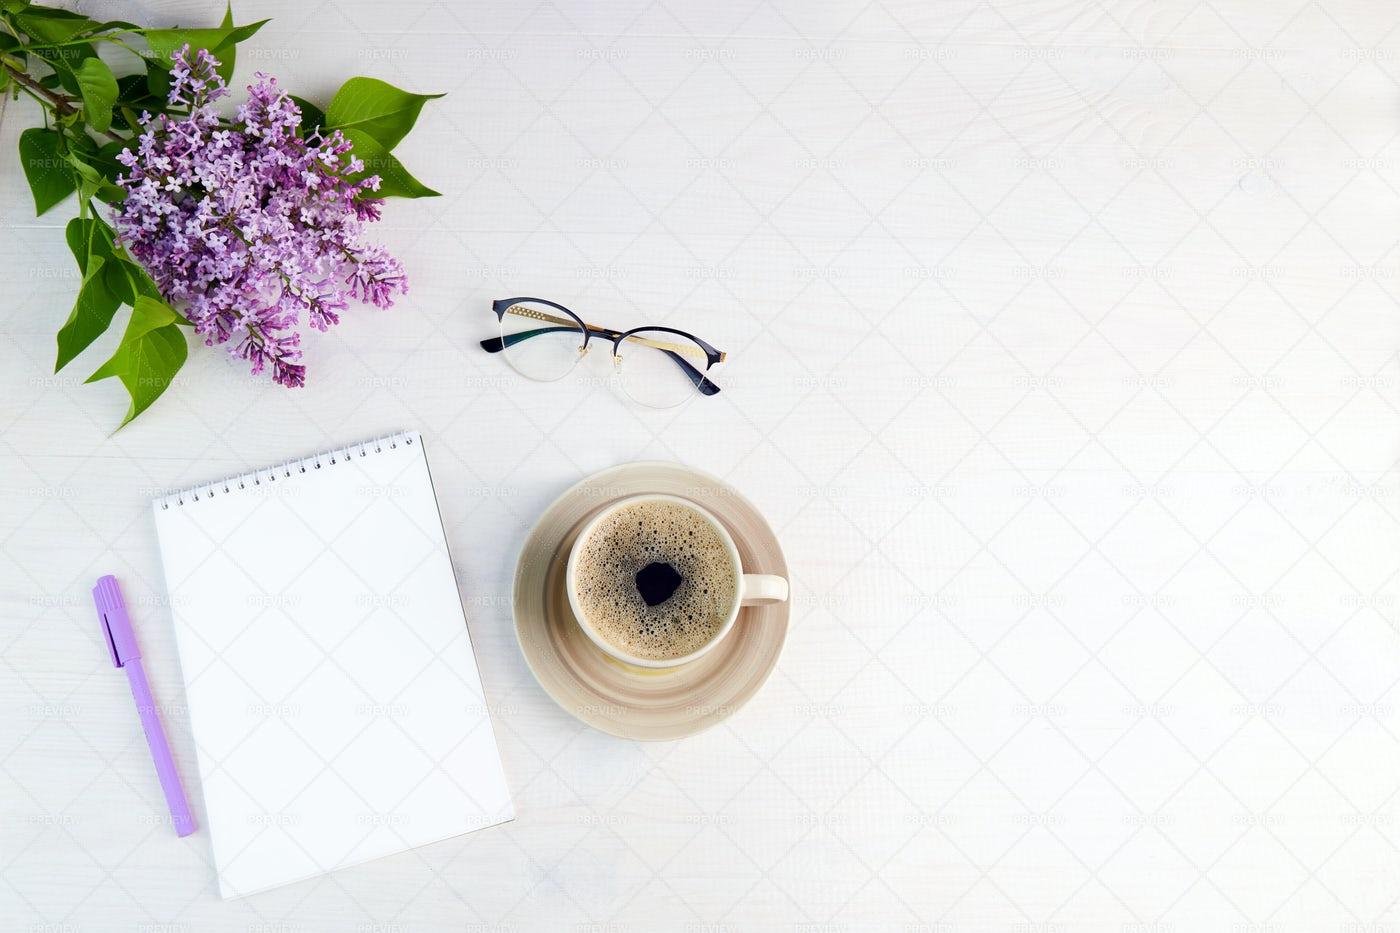 Lilac Branch, Coffee, Notebook: Stock Photos